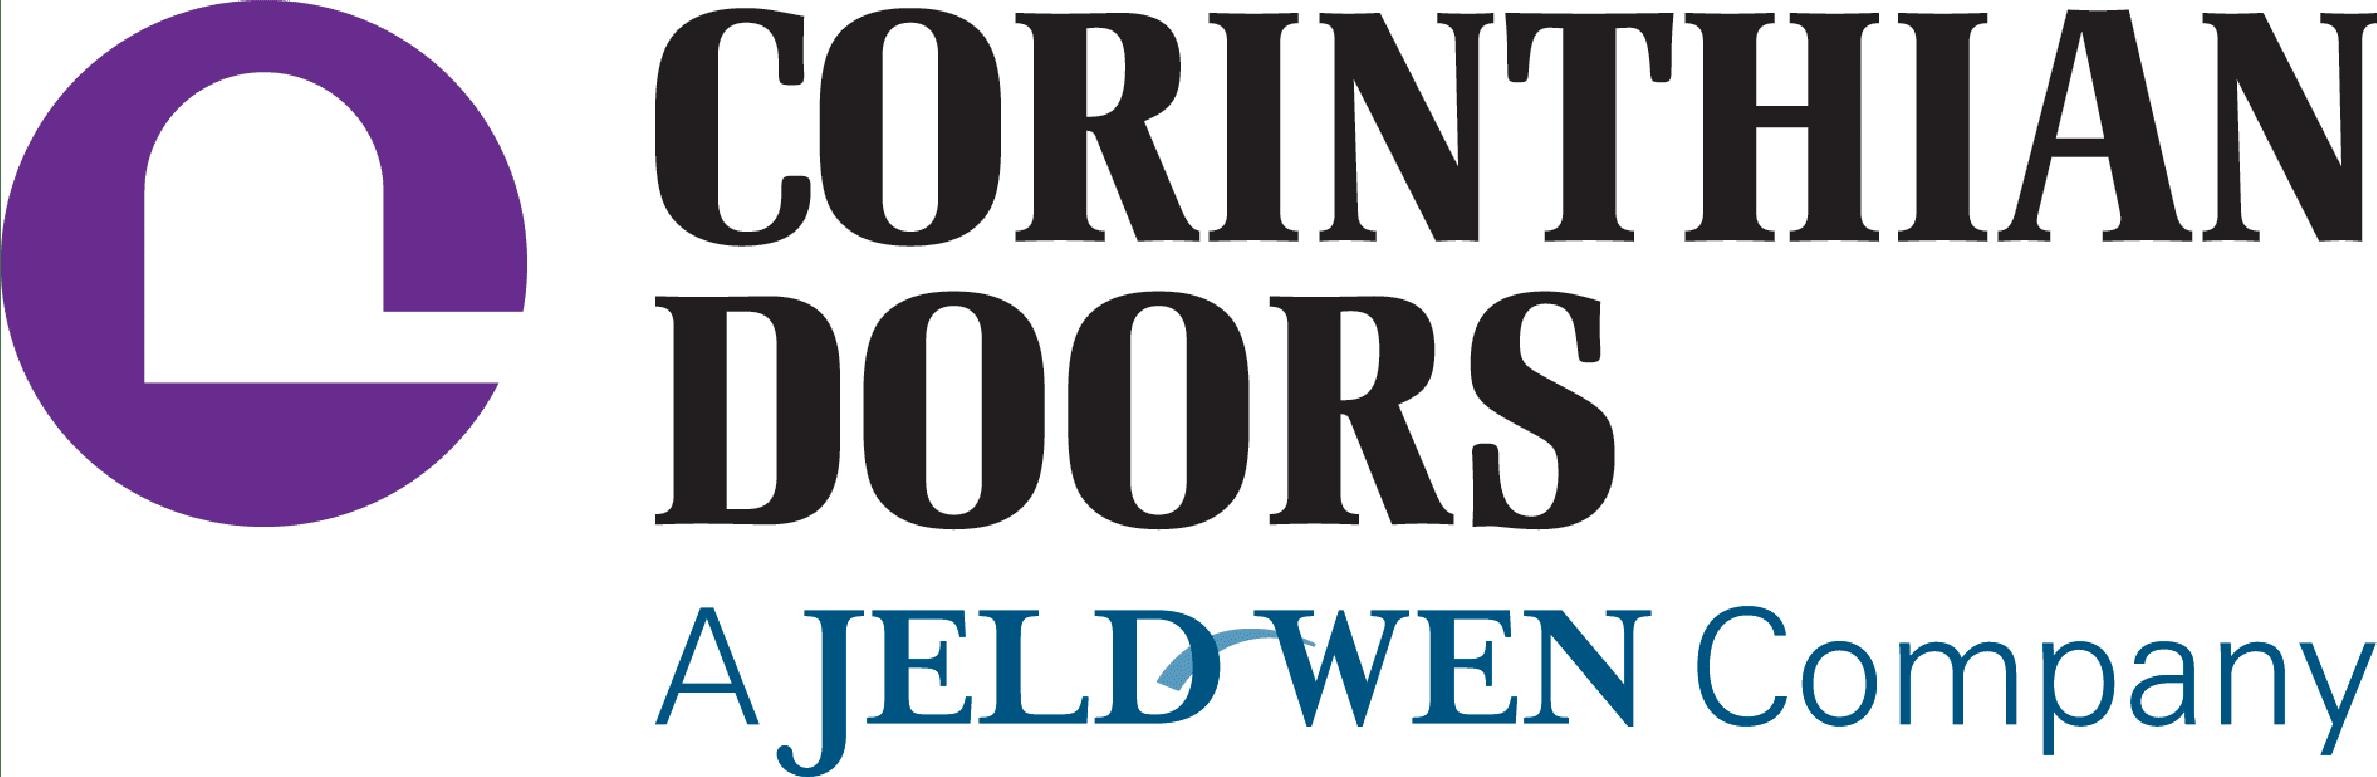 Corinthian Doors